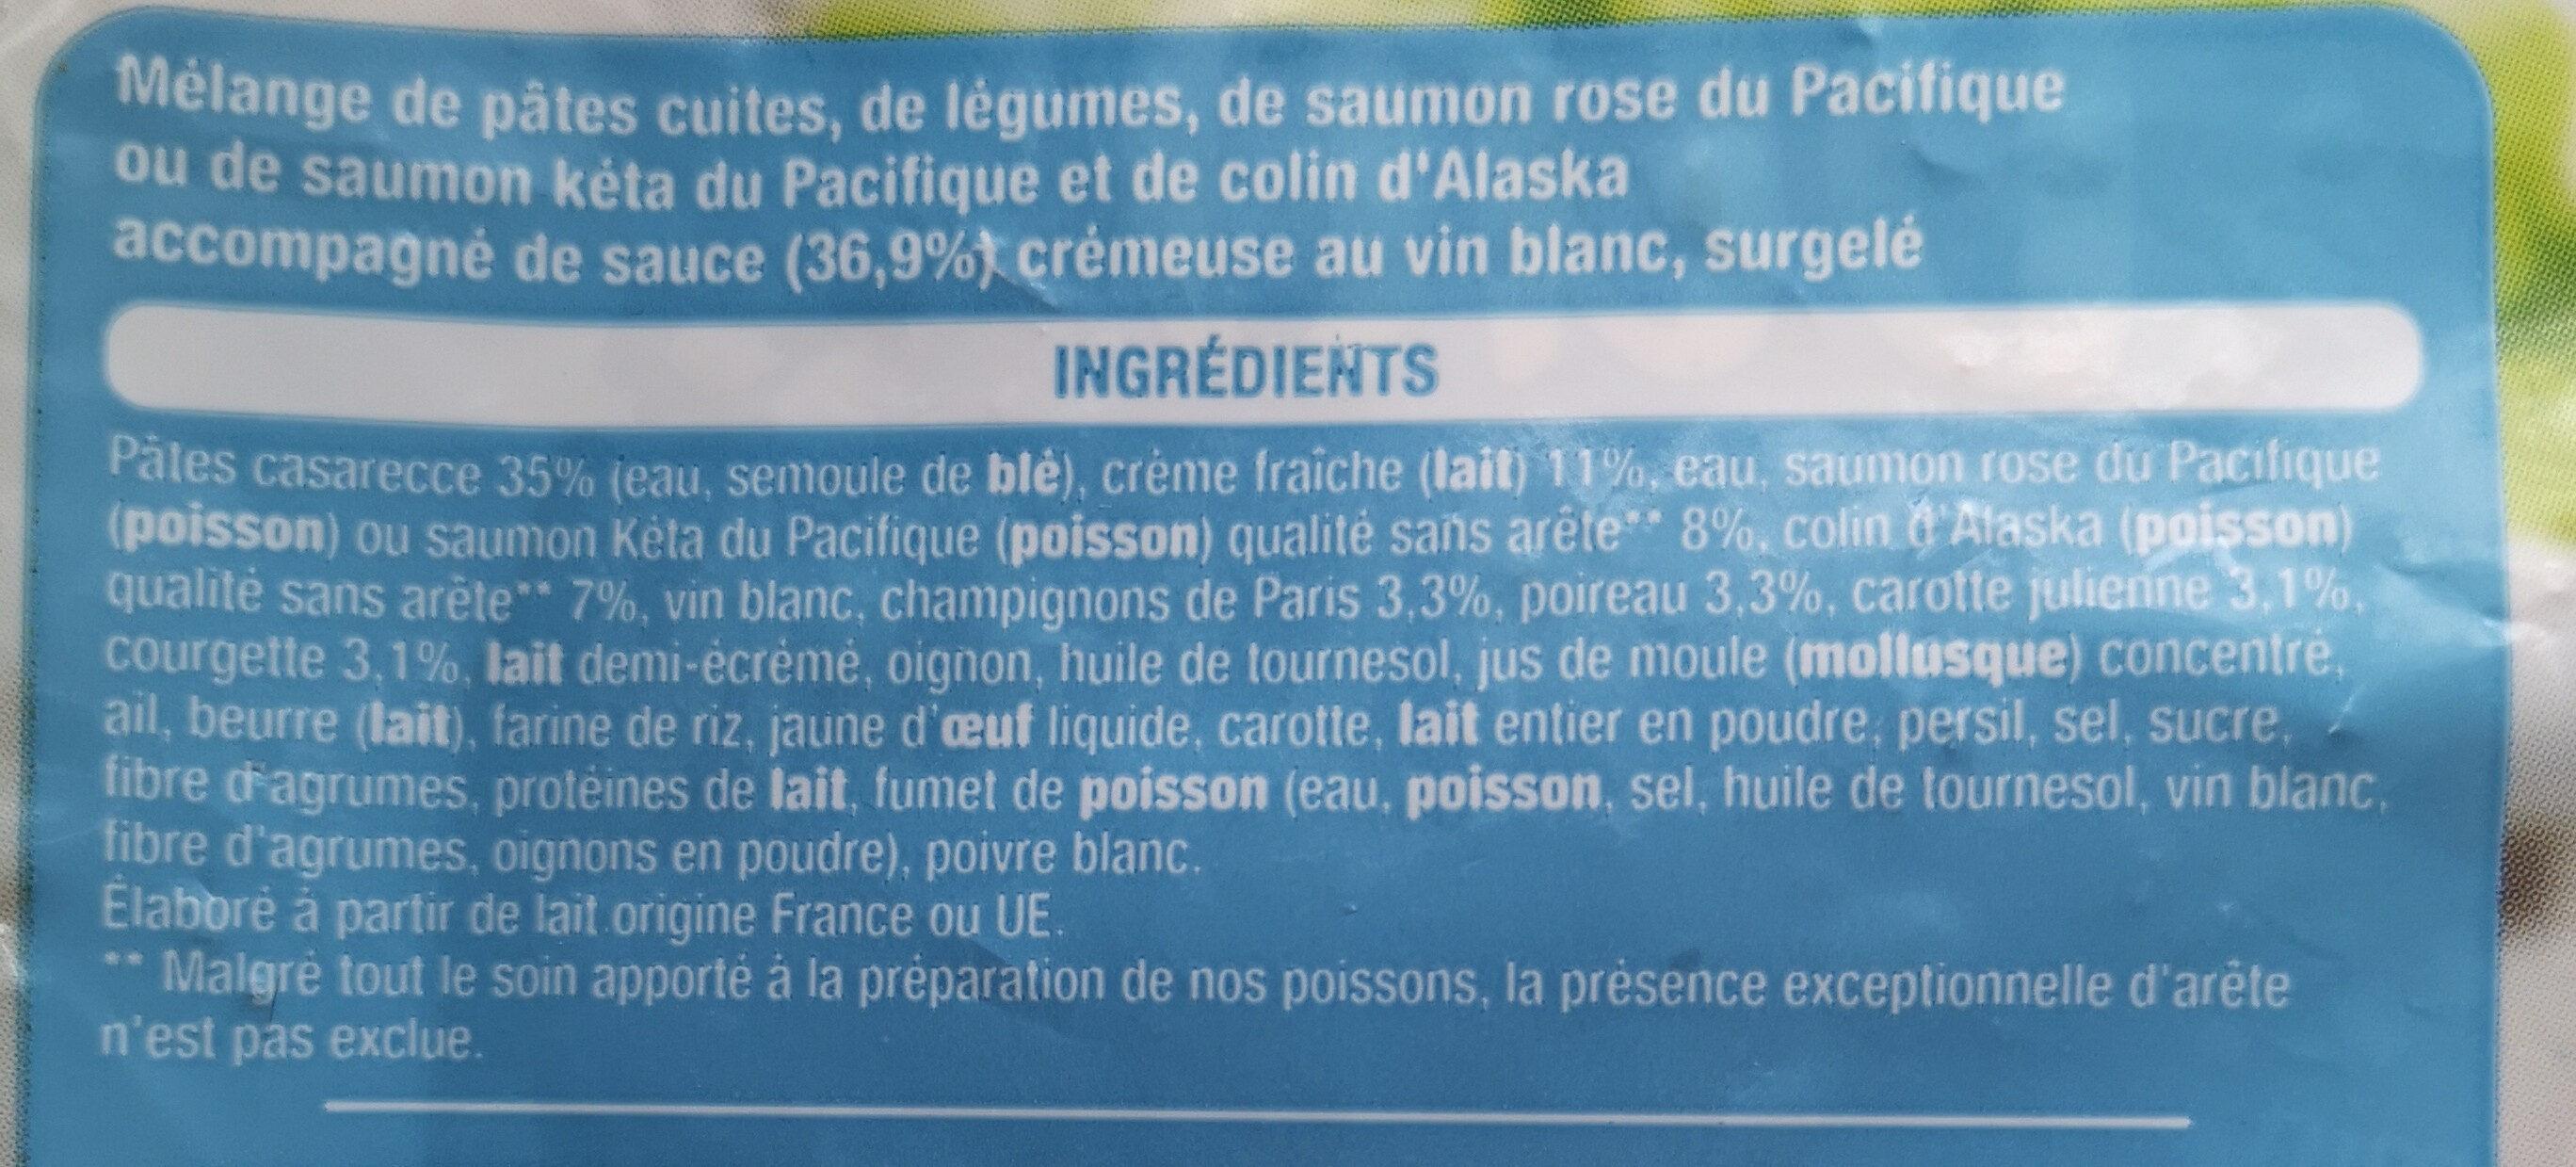 Pâtes et duo de poissons - Ingrediënten - fr